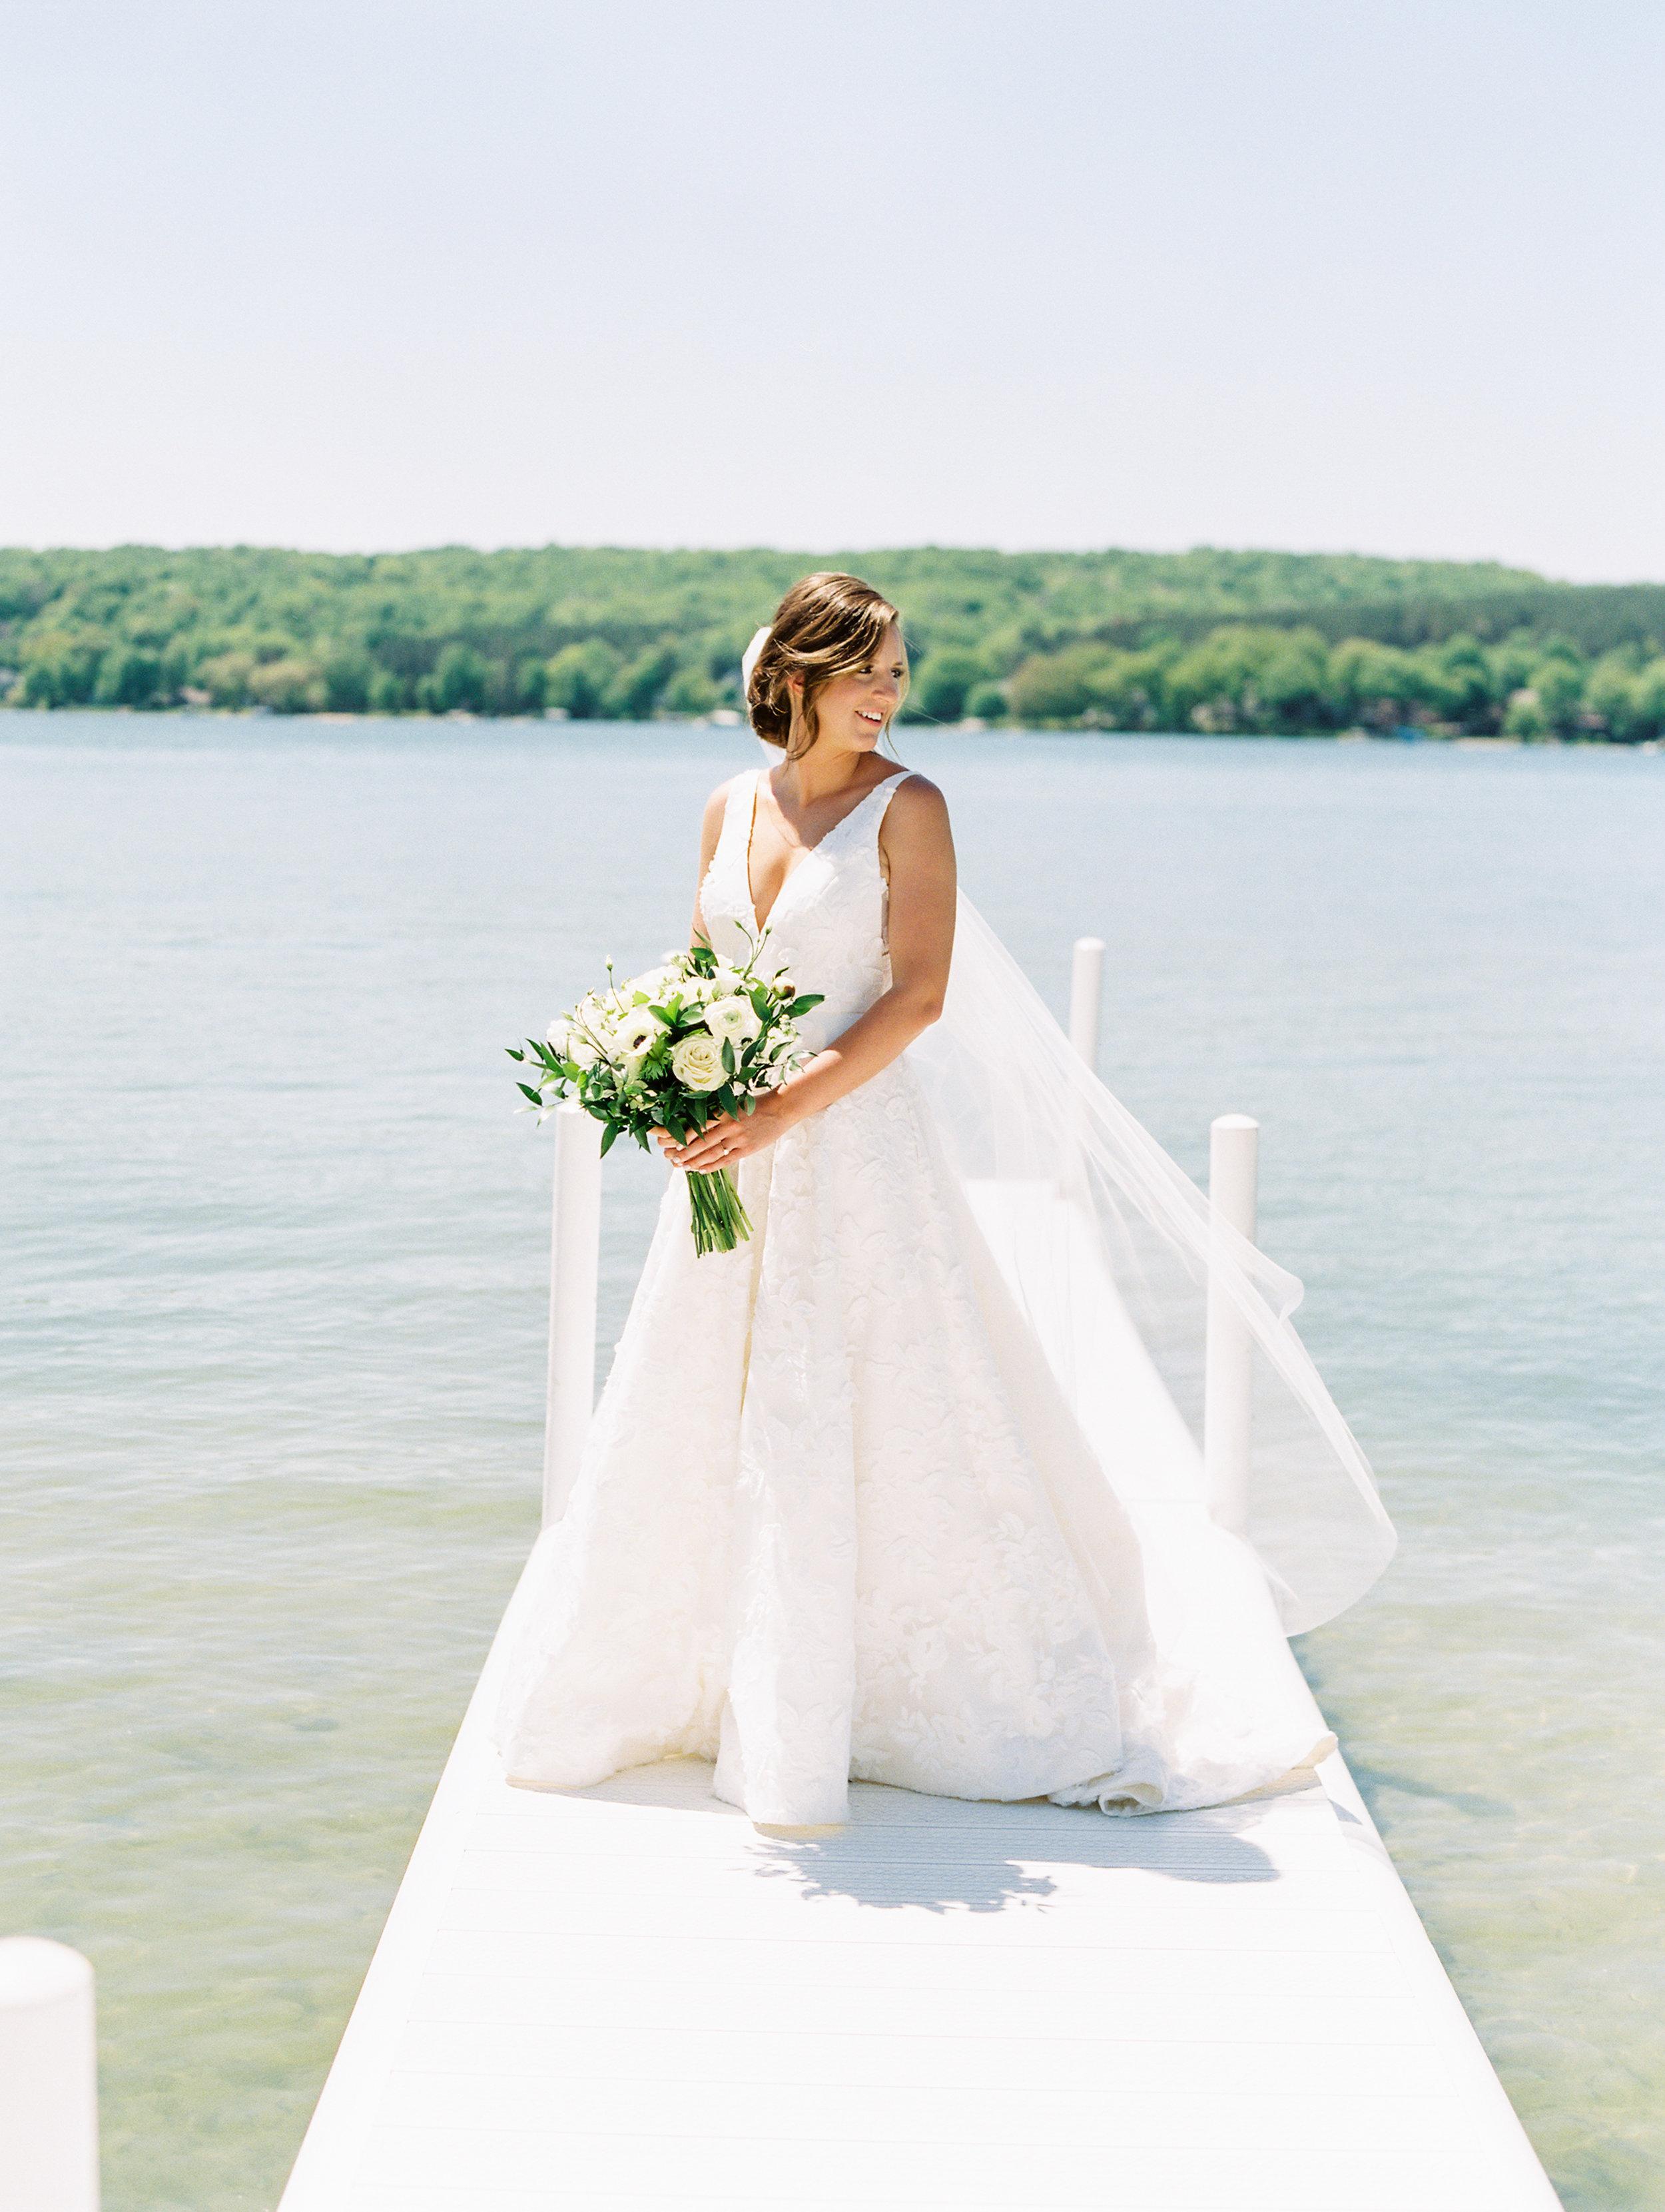 DeGuilio+Wedding+Bridal+Partyf-51.jpg